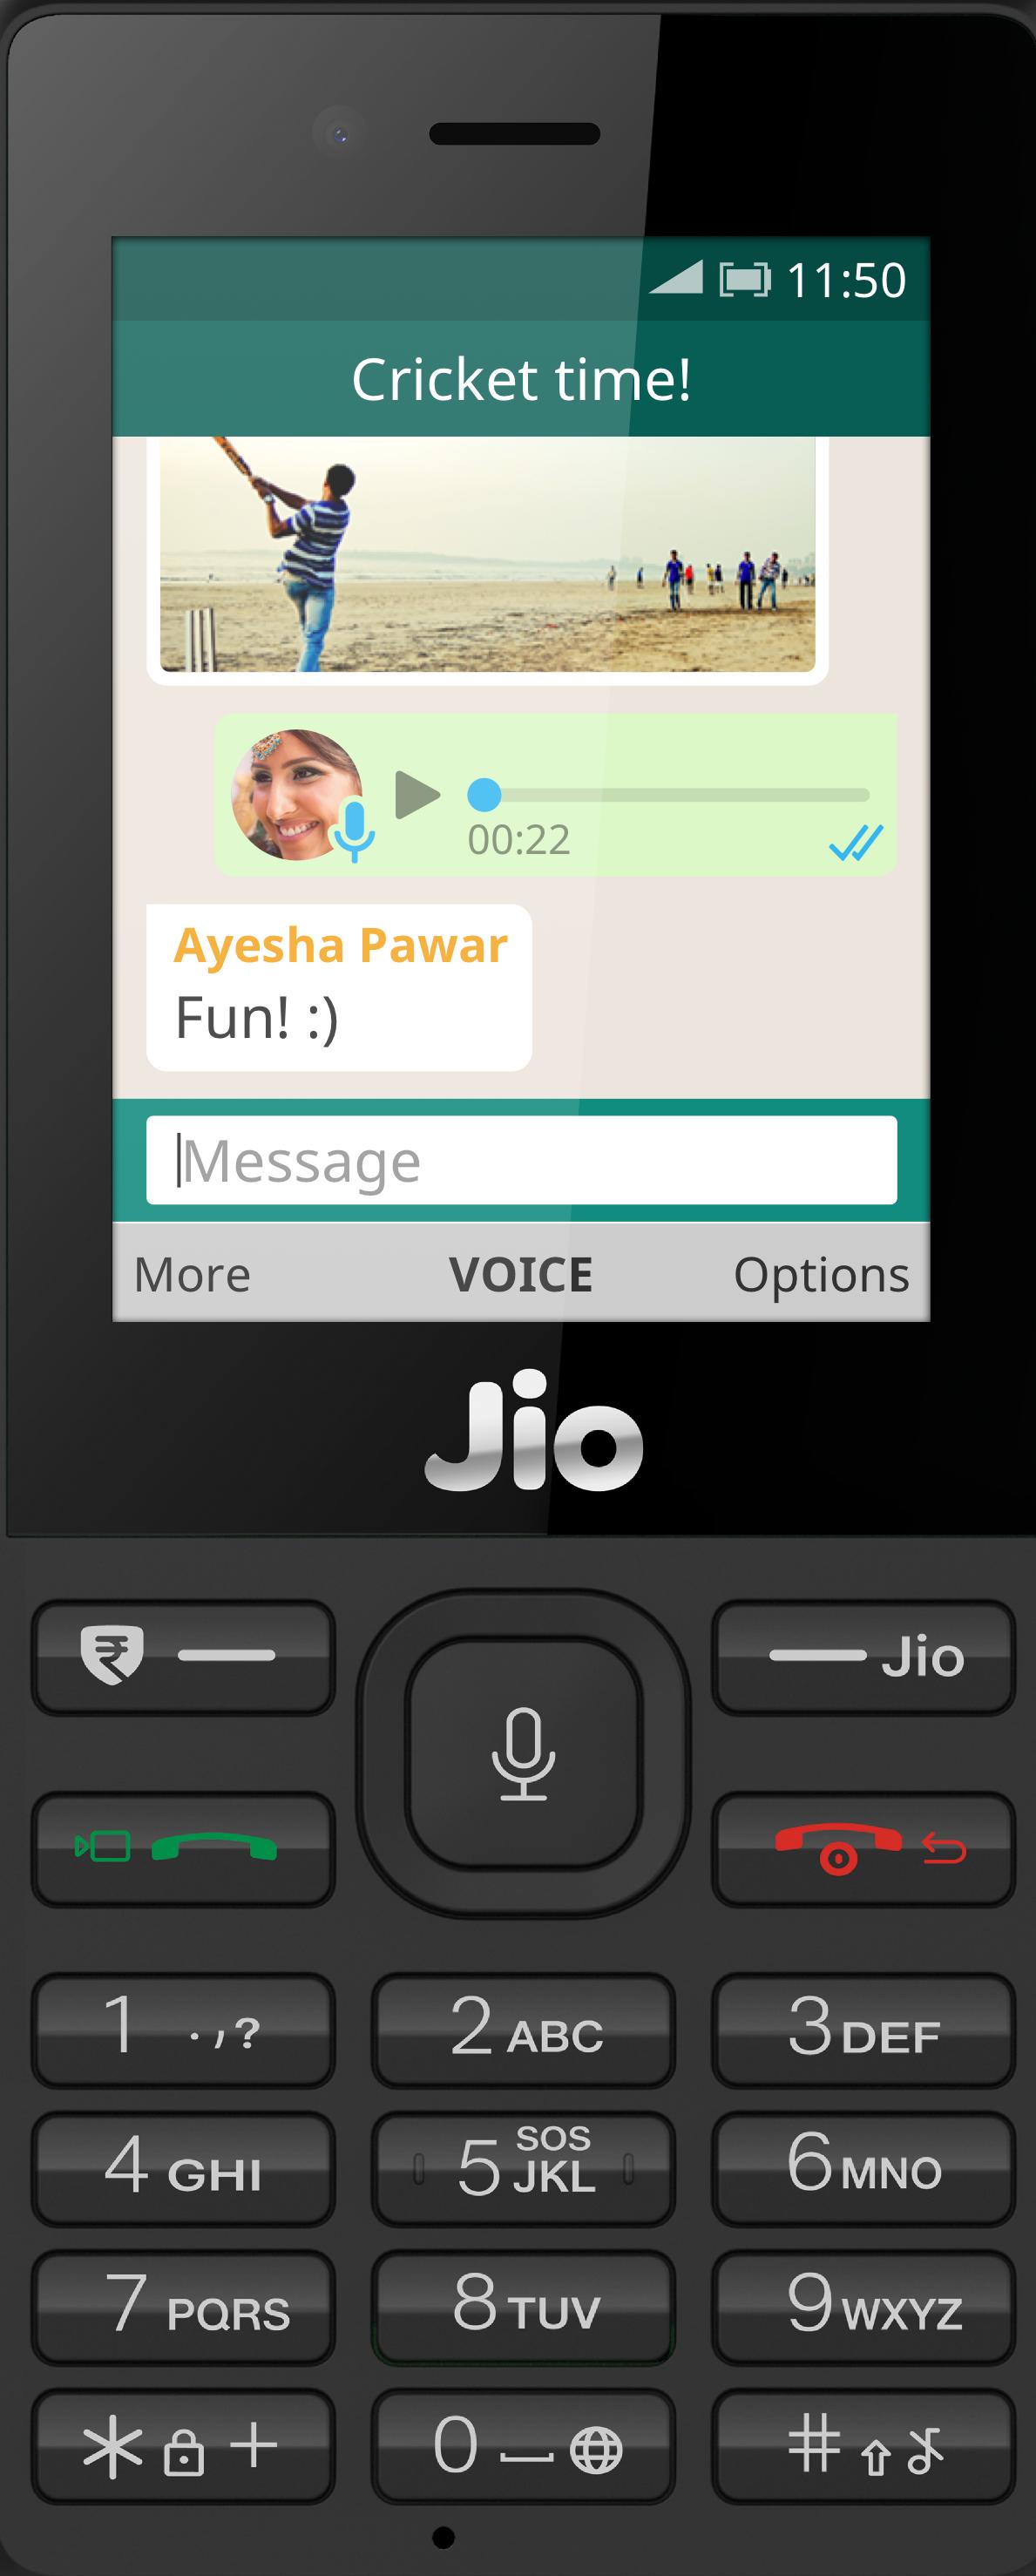 How To Make Facebook Id In Jio Phone Facebook In Jio Phone